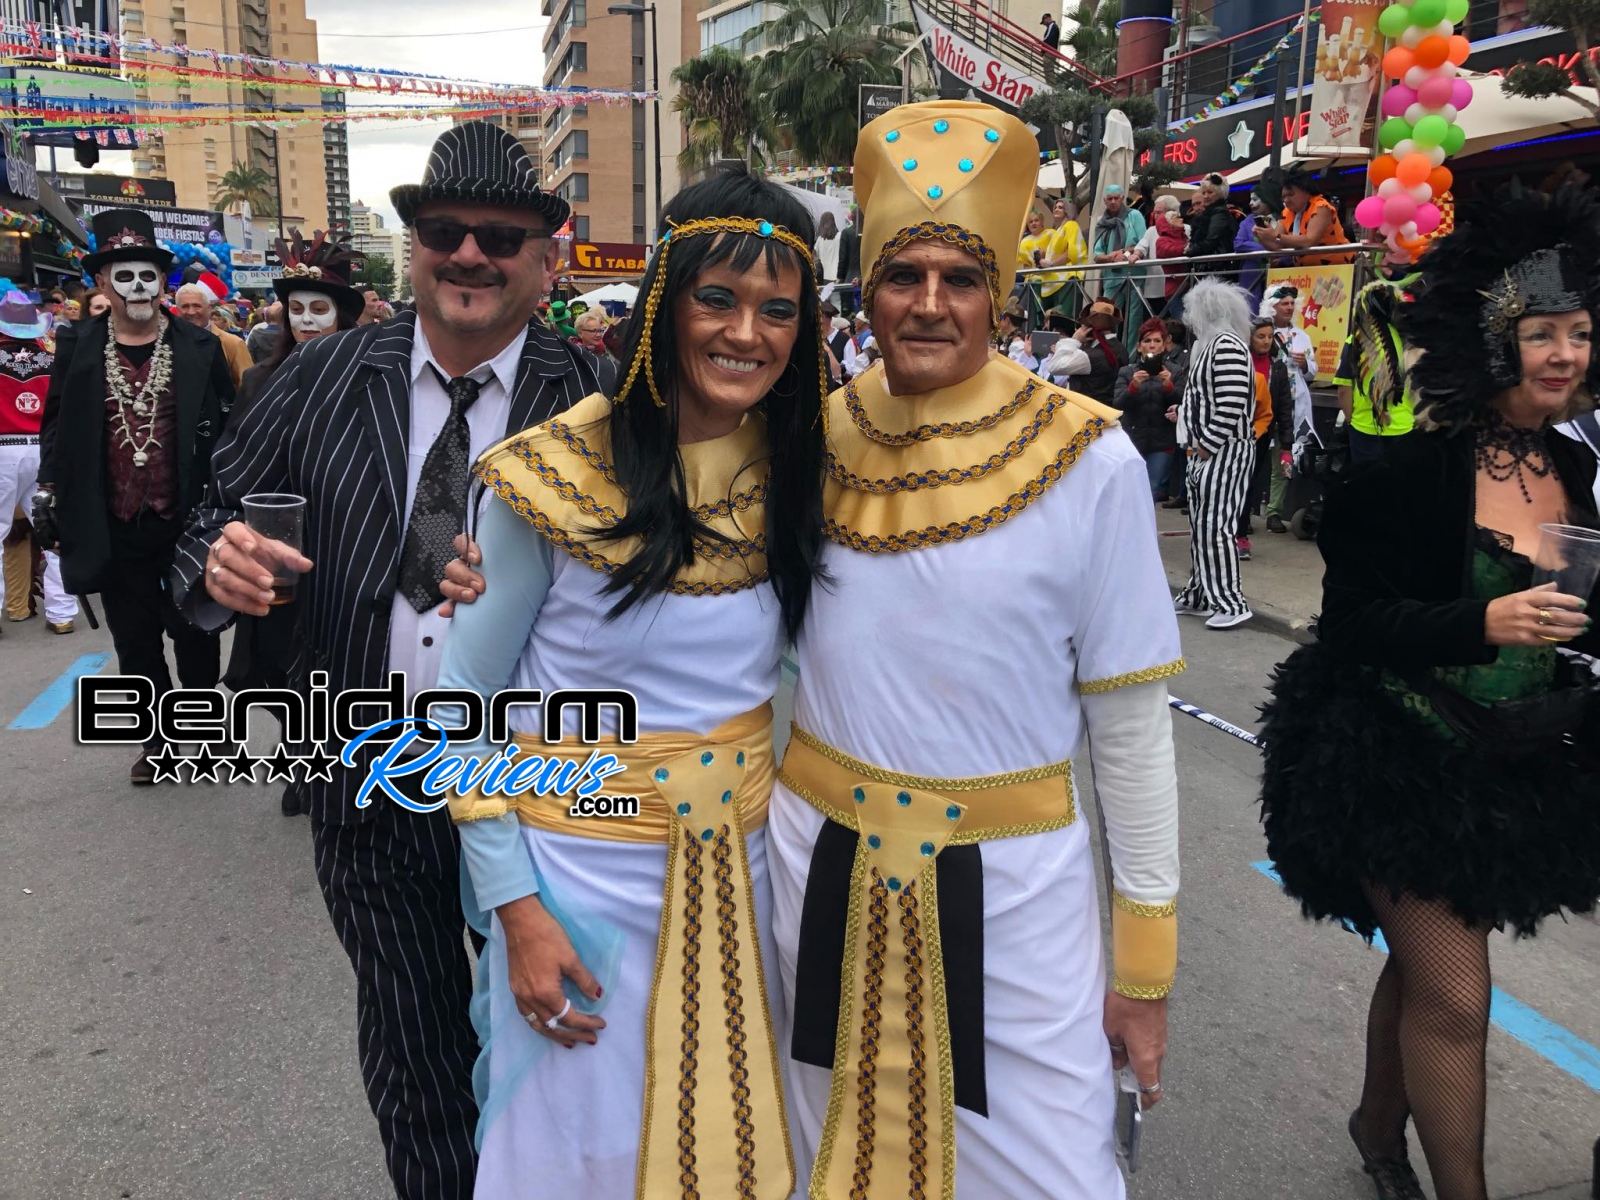 Benidorm-Fiestas-2019-Fancy-Dress-248